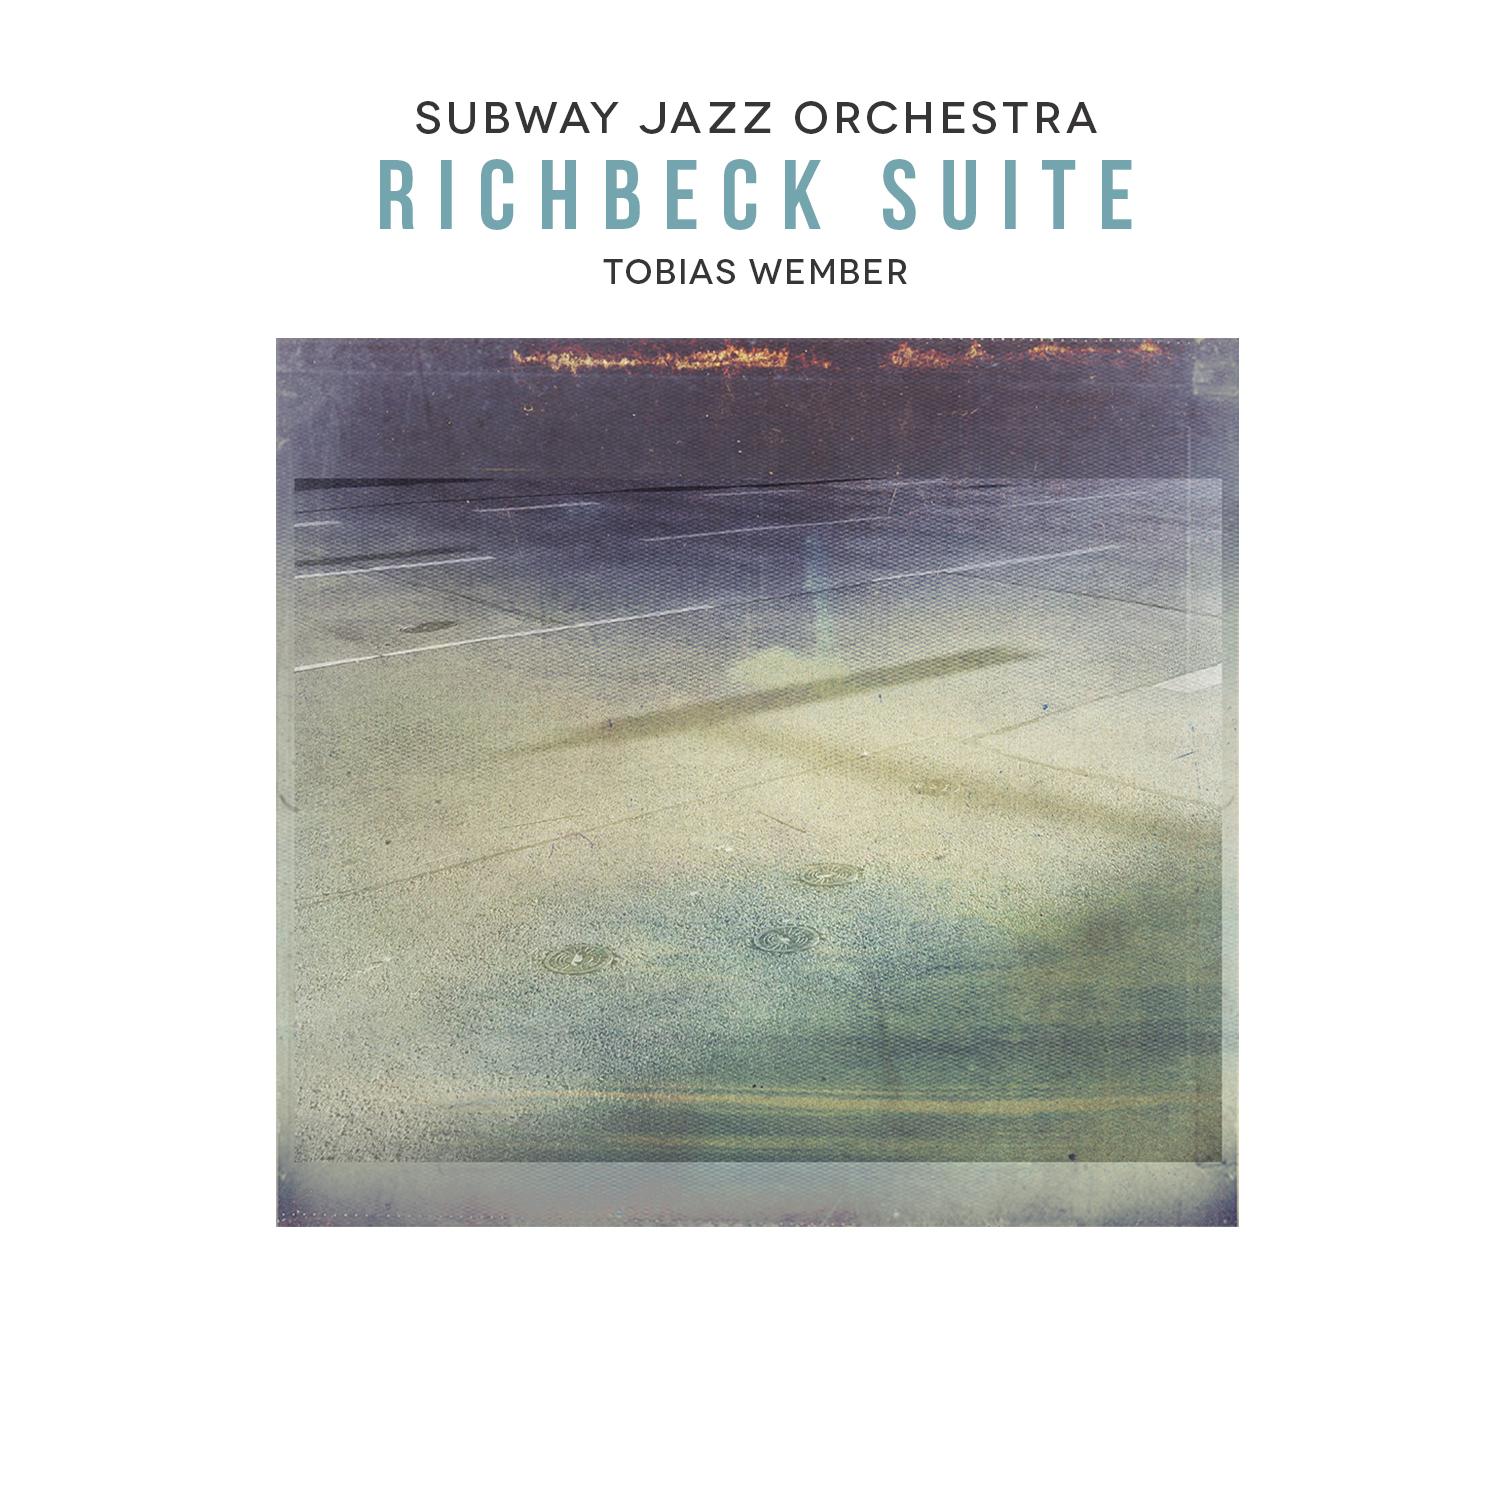 Subway Jazz Orchestra/Tobias Wember - Richbeck Suite